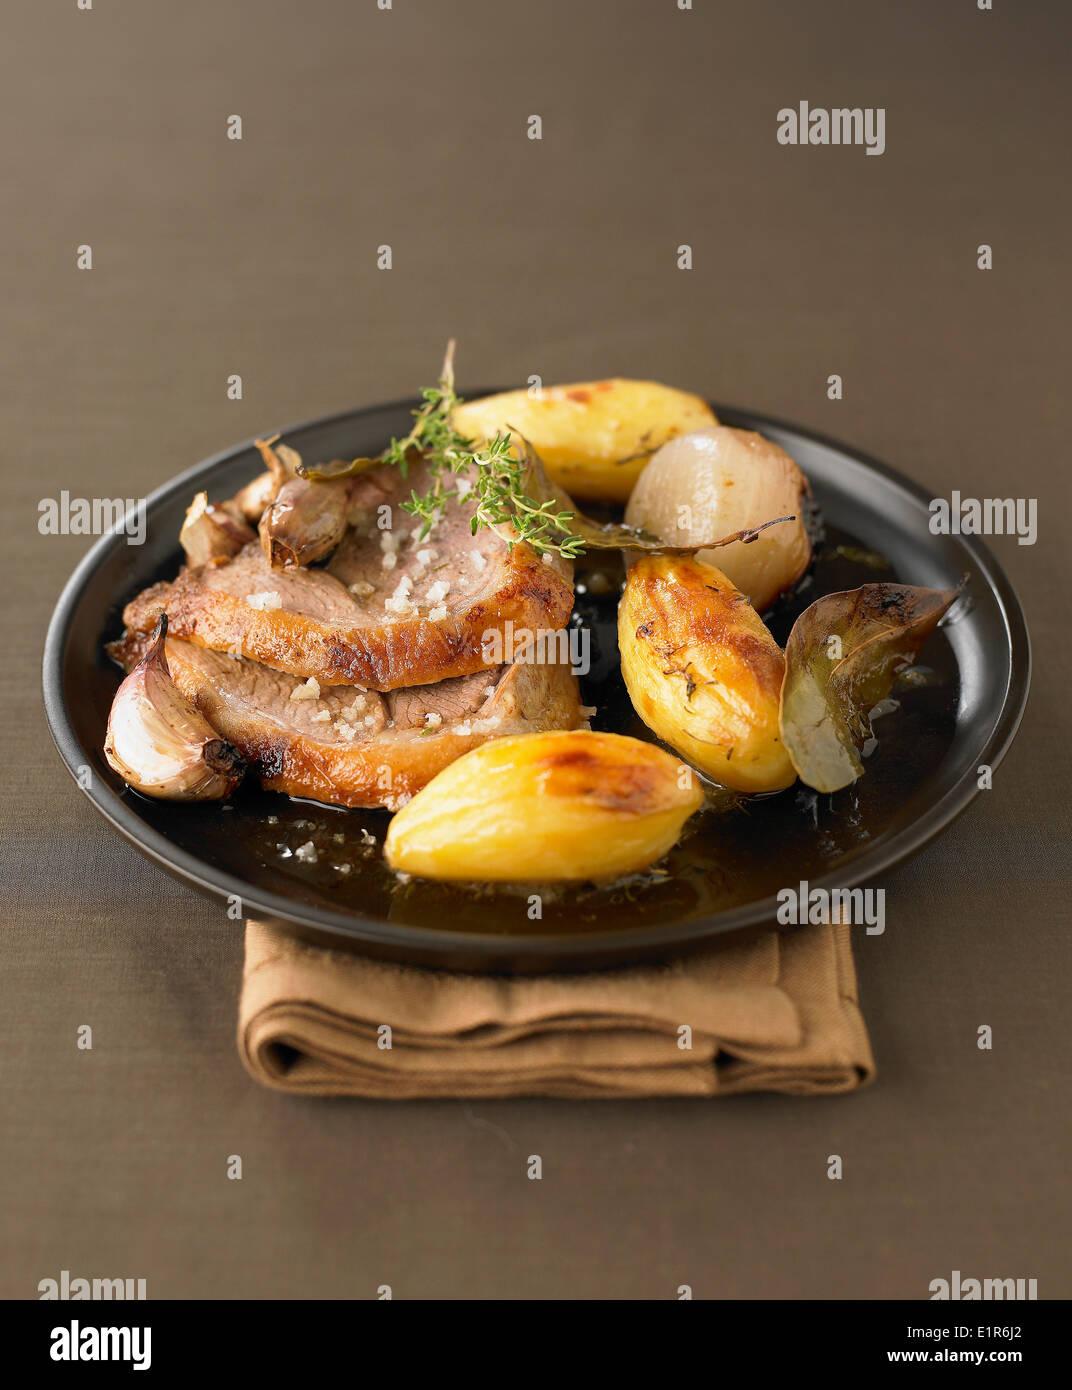 Leg of lamb with garlic,thyme and sauteed potatoes - Stock Image